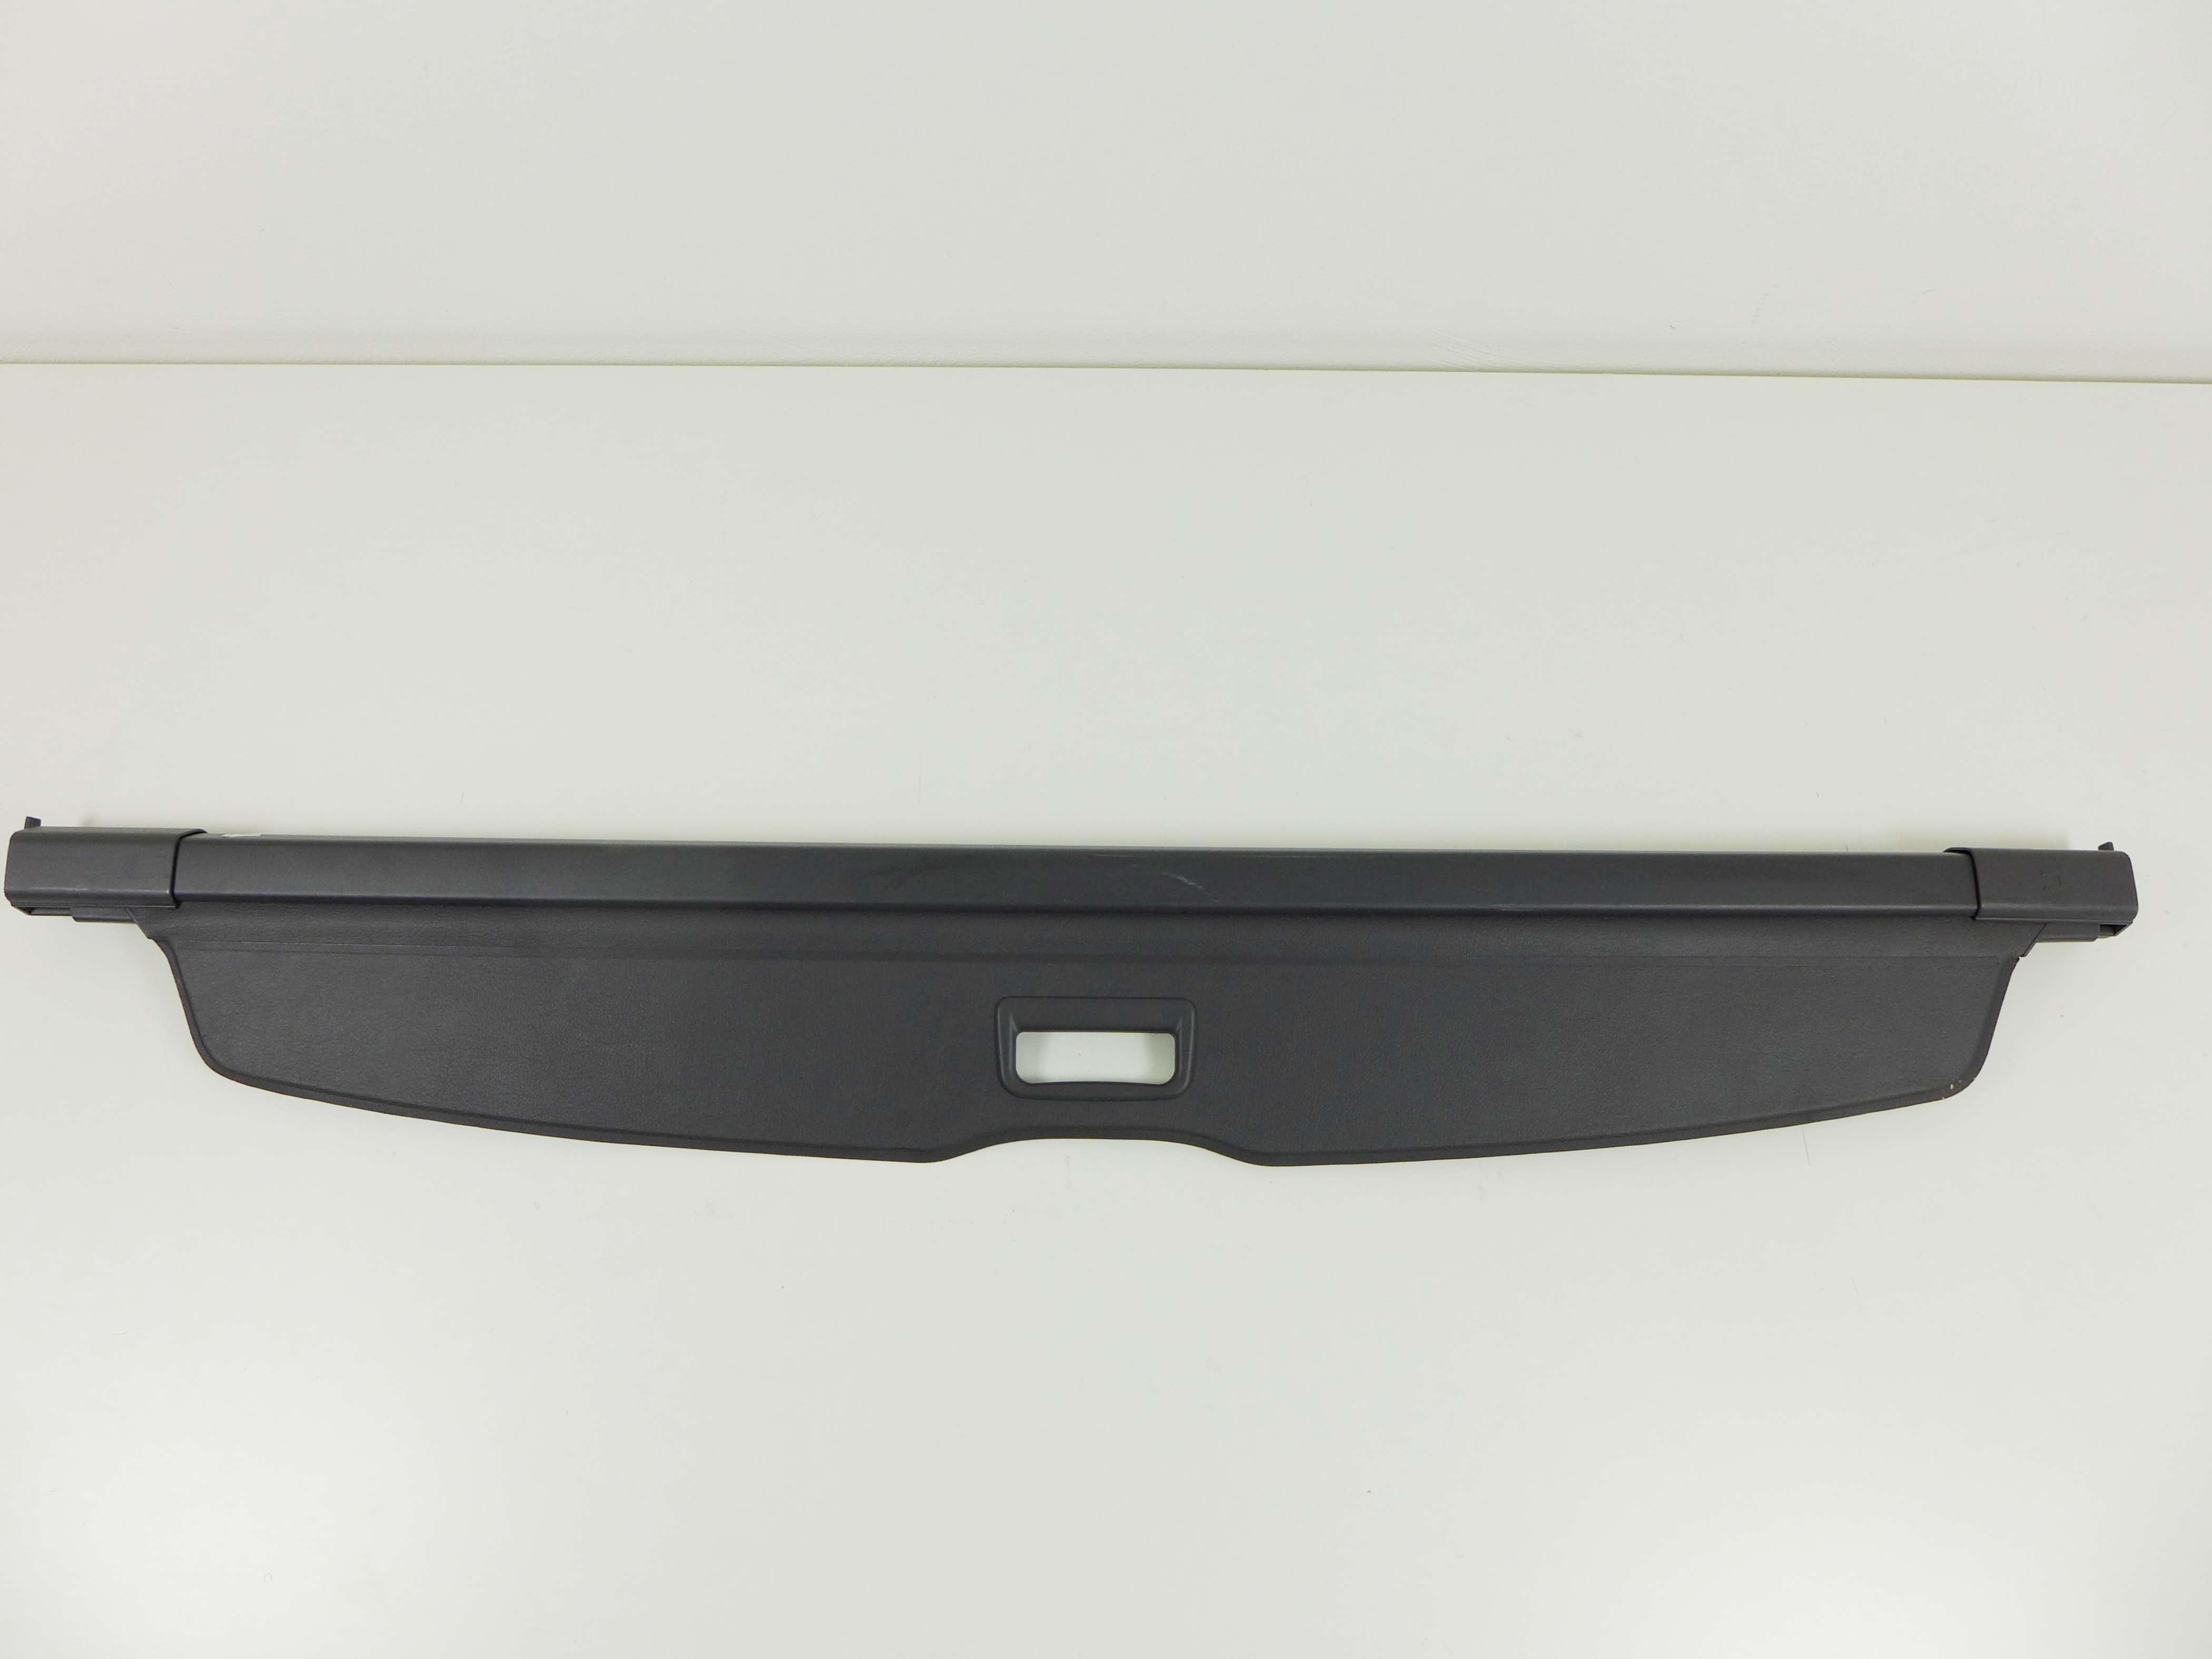 laderaumabdeckung vw touran kofferraumabdeckung 1t0 867. Black Bedroom Furniture Sets. Home Design Ideas